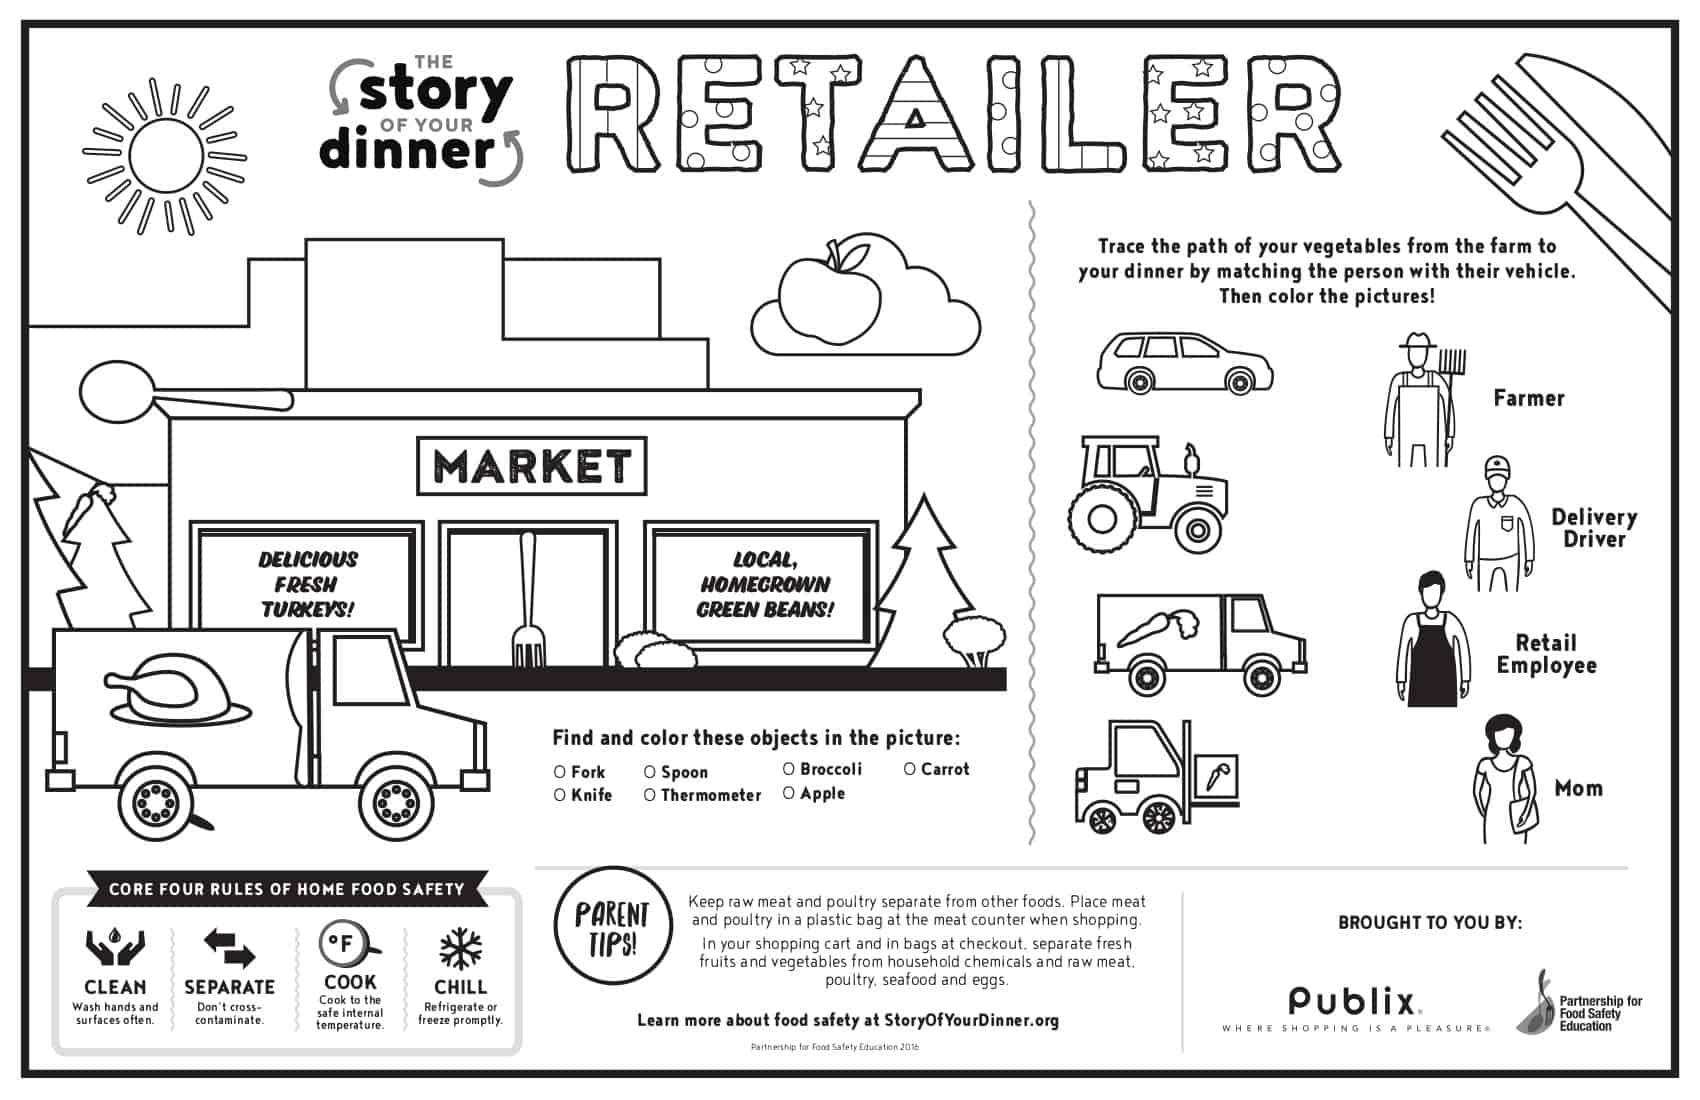 Retailer placemat